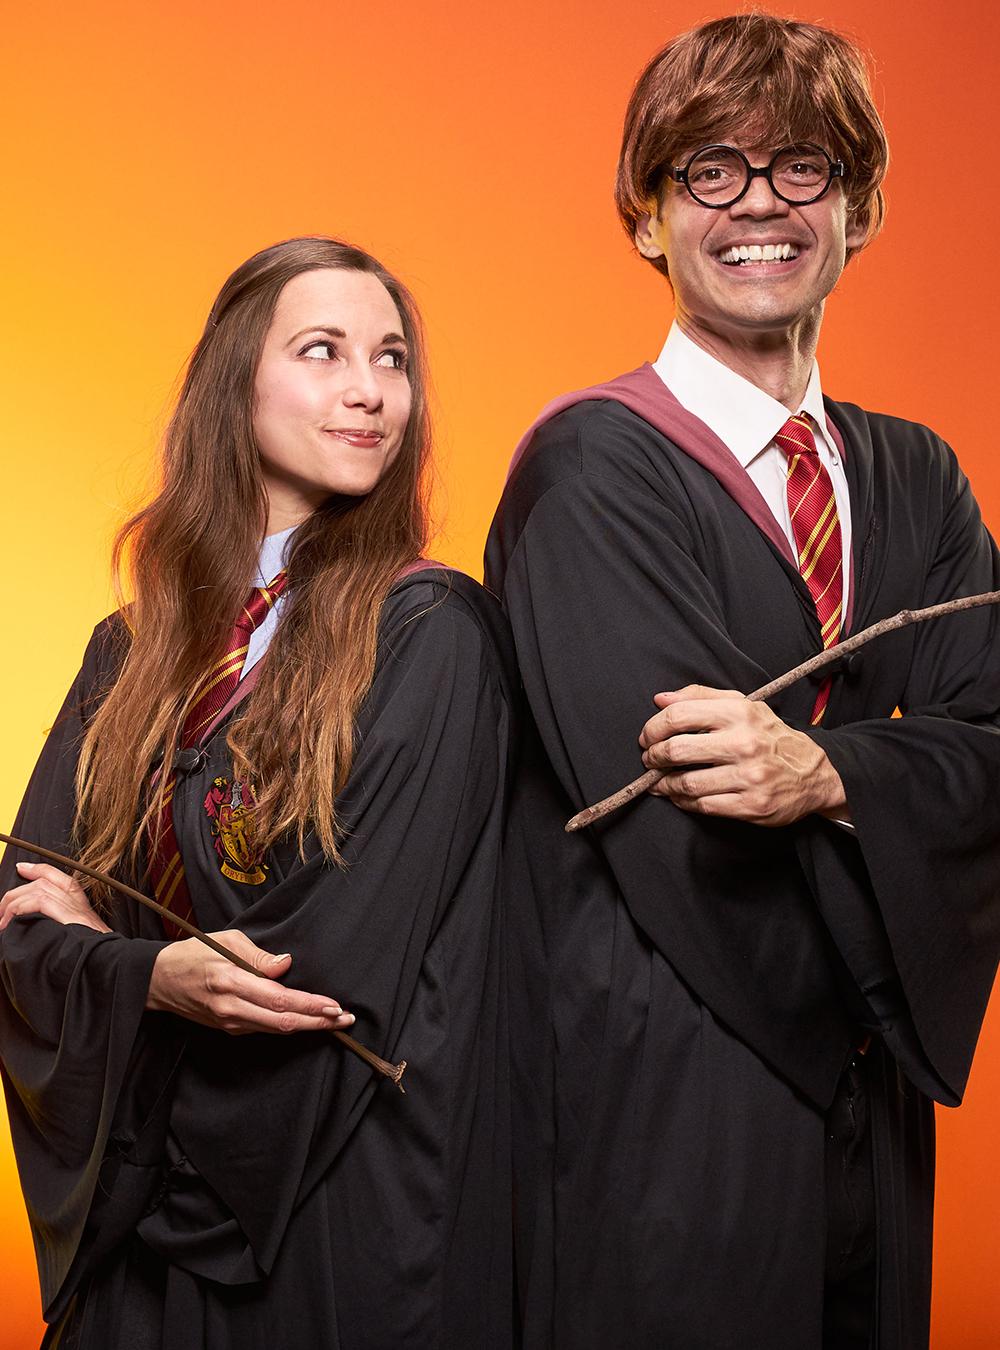 Hermione Grandger & Harry Potter